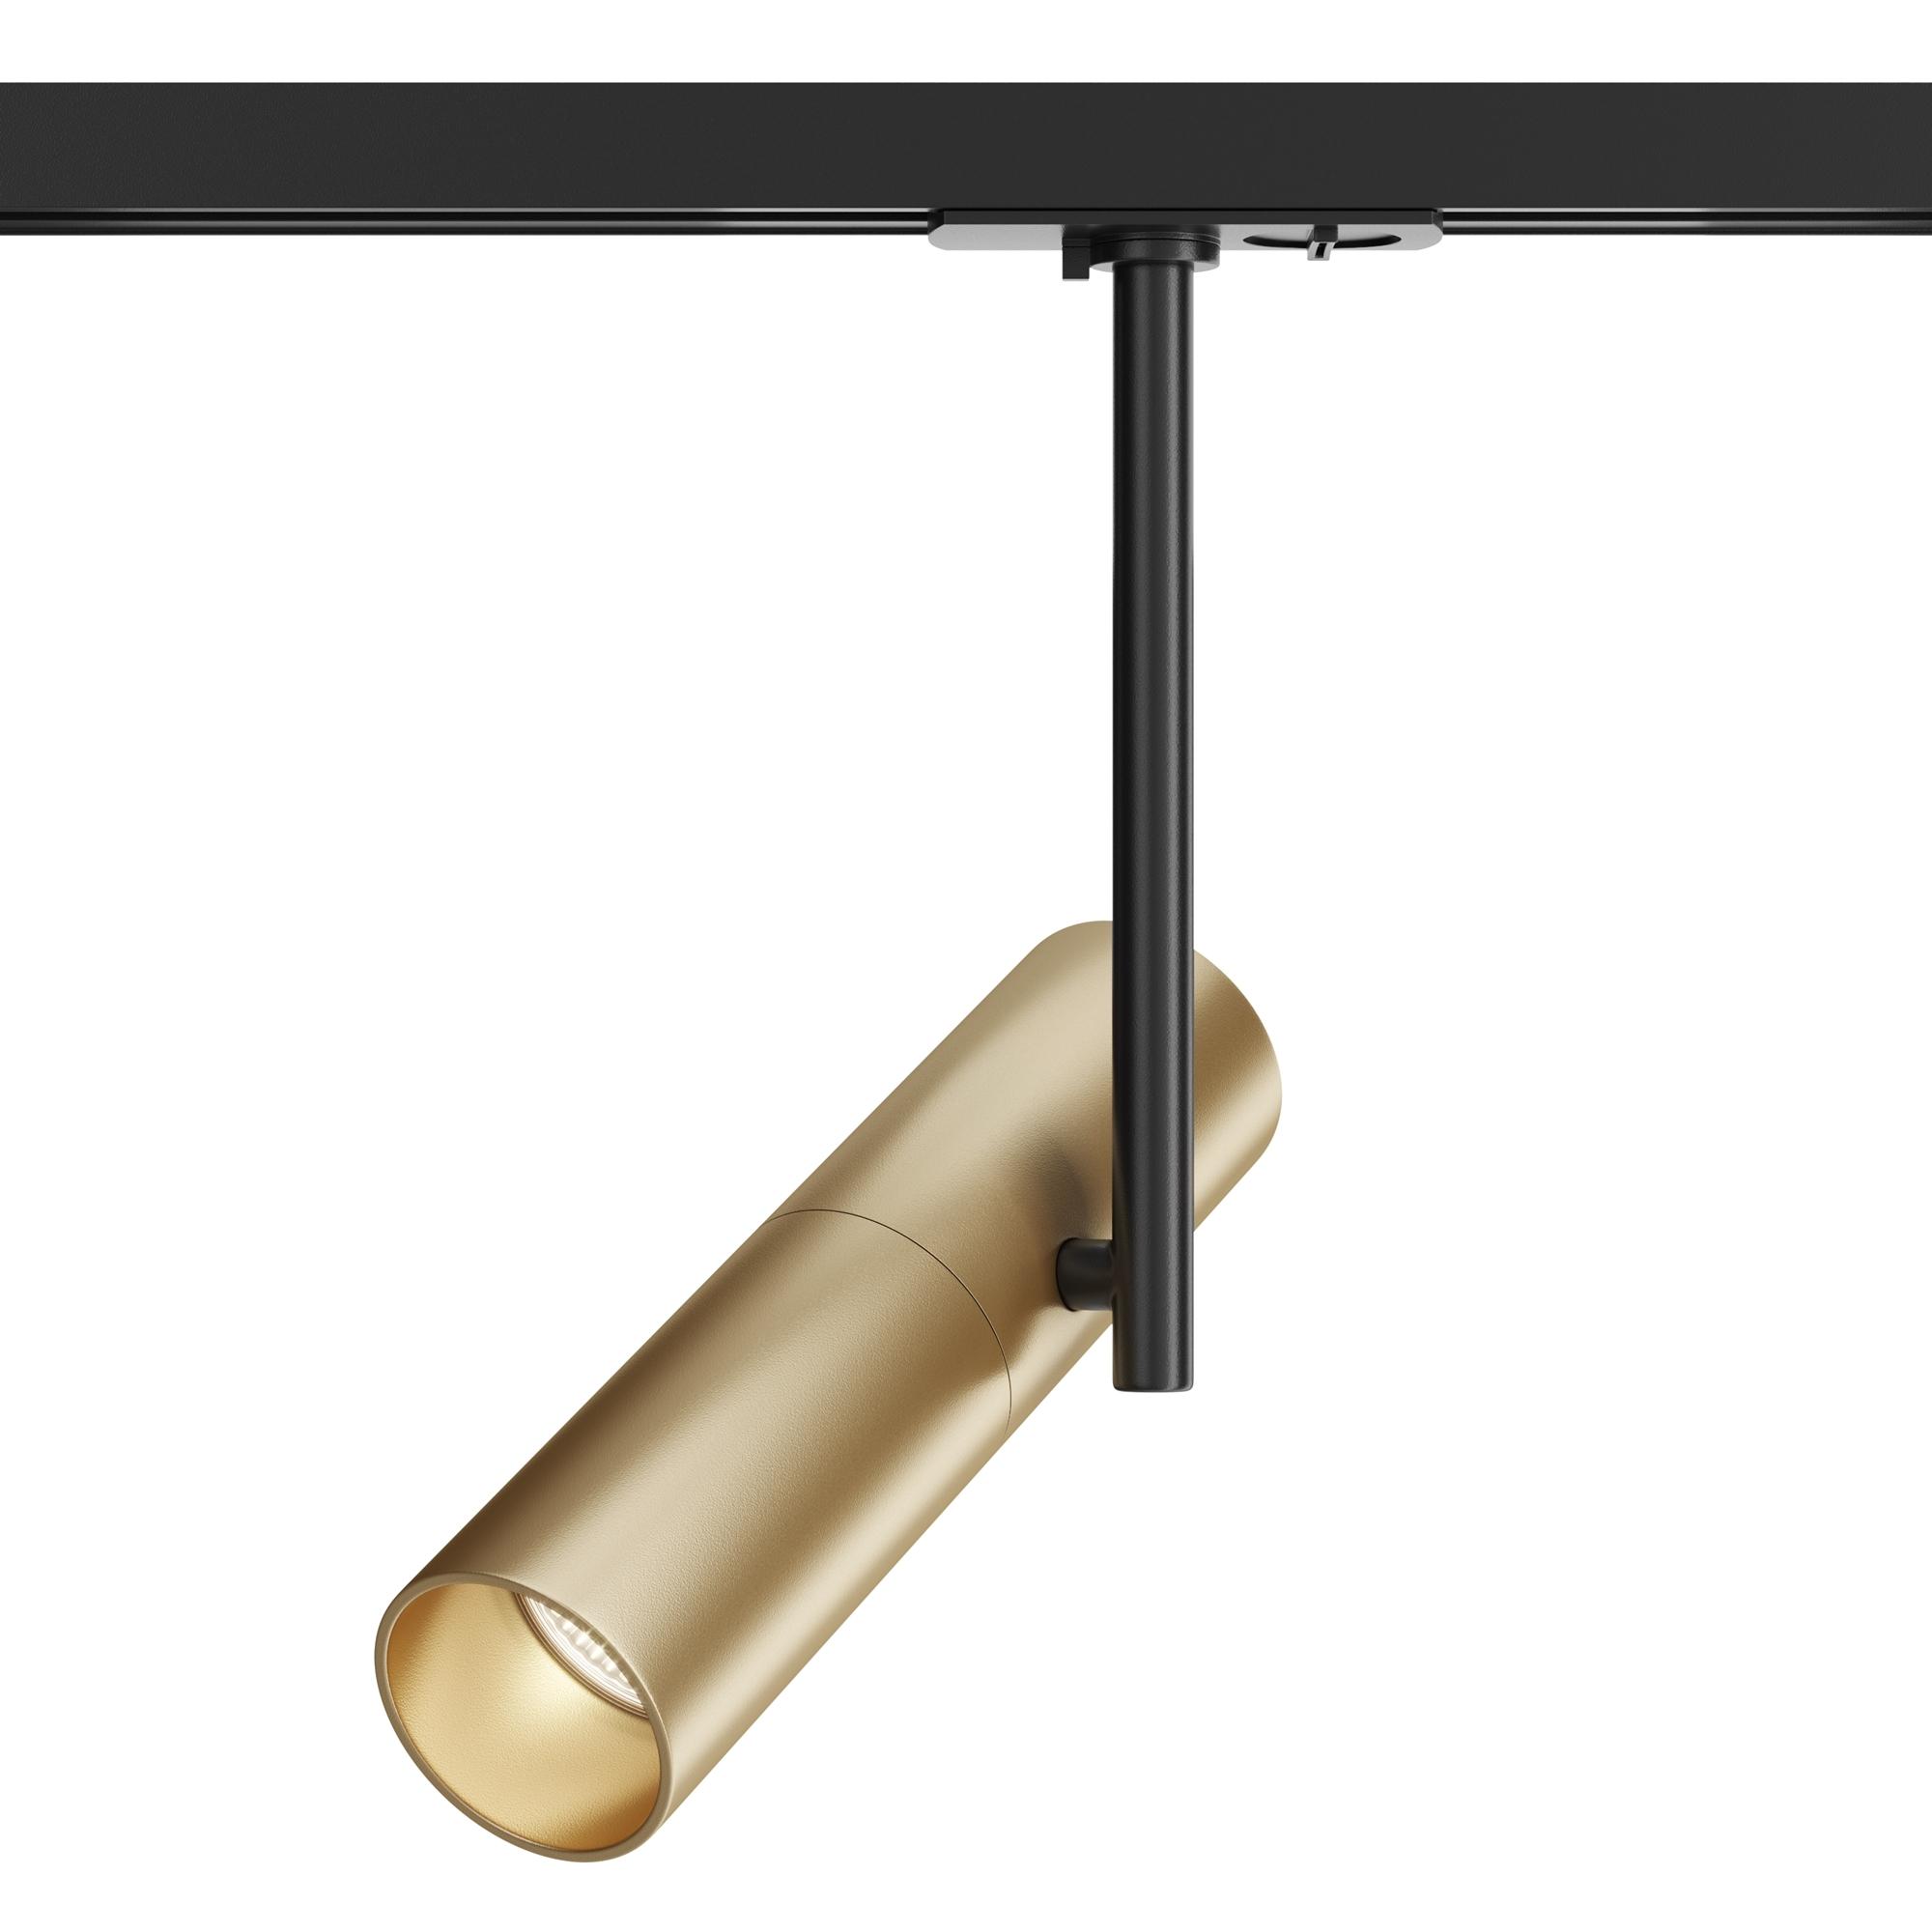 Светильник Maytoni Elti TR005-1-GU10-BG, 1xGU10x50W, черный, золото, металл - фото 1